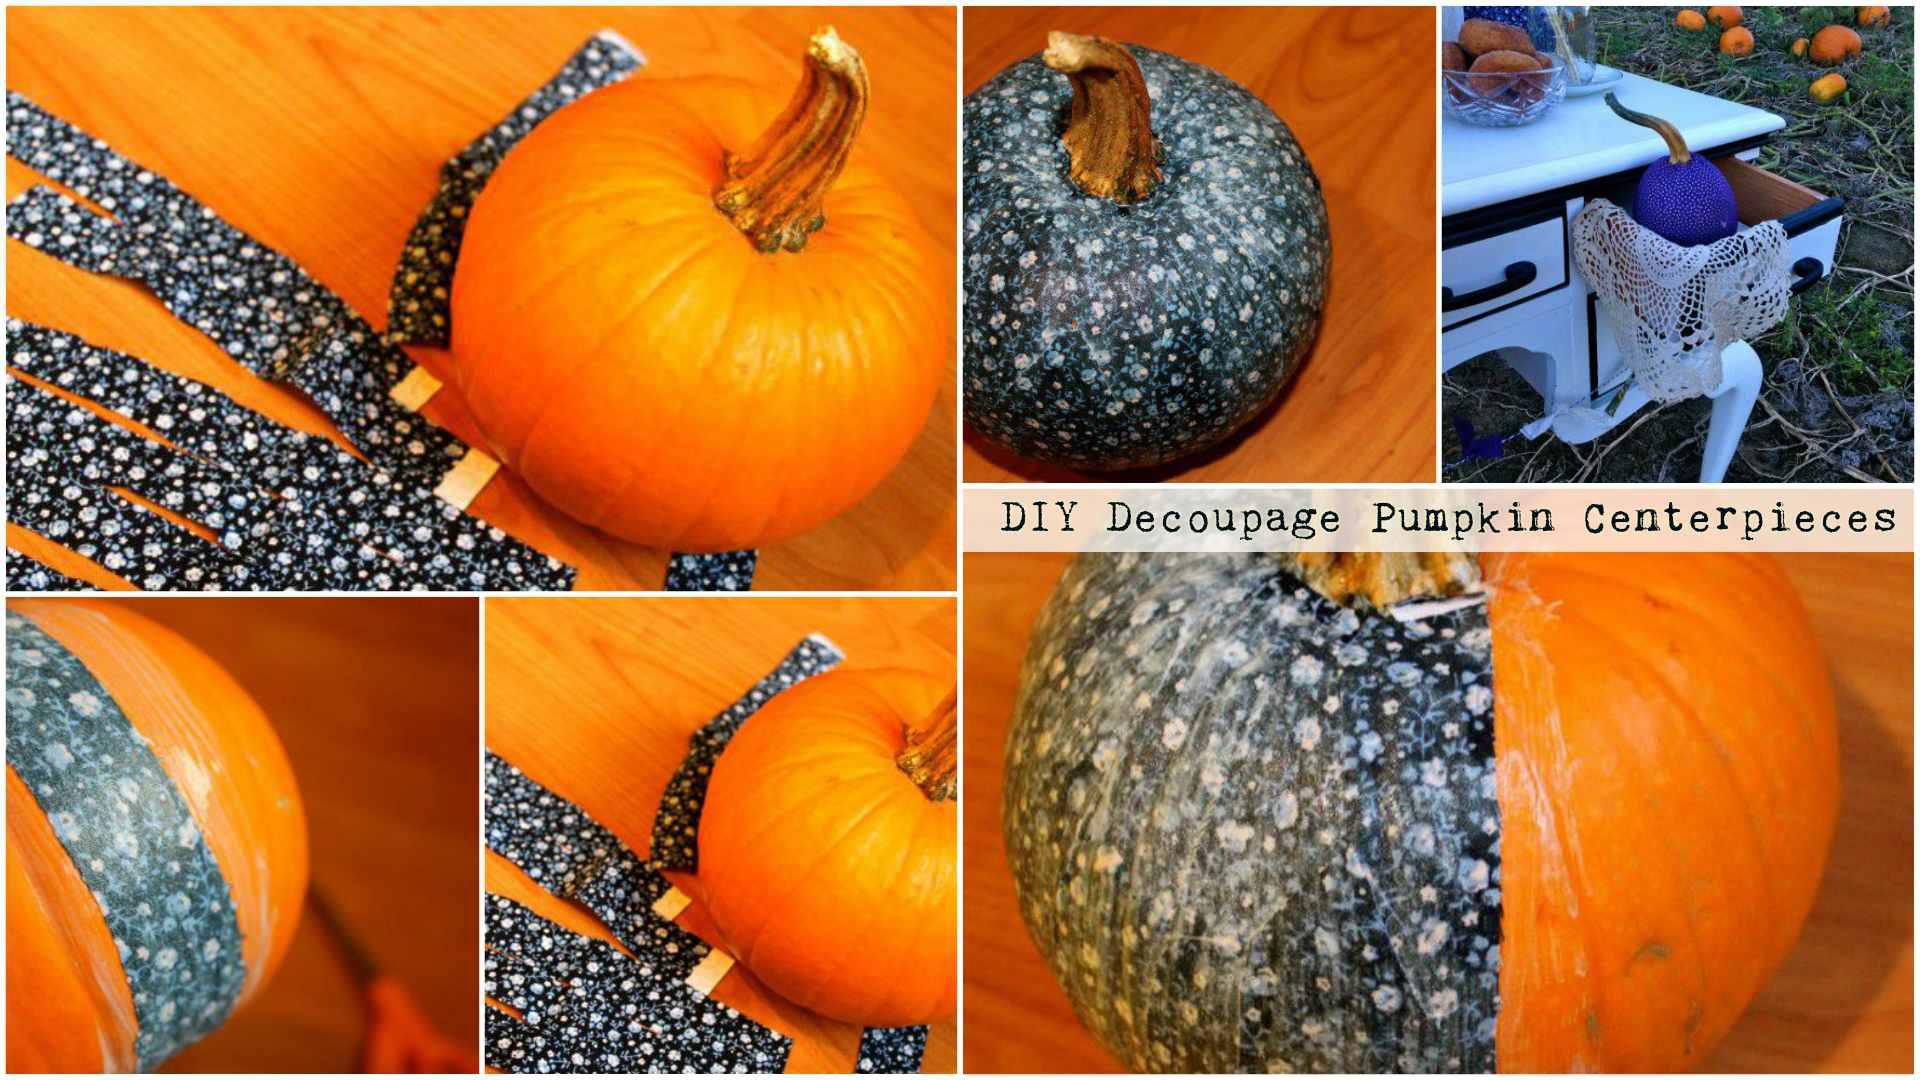 DIY Decoupage Pumpkin Centerpieces - Cooper's Catering